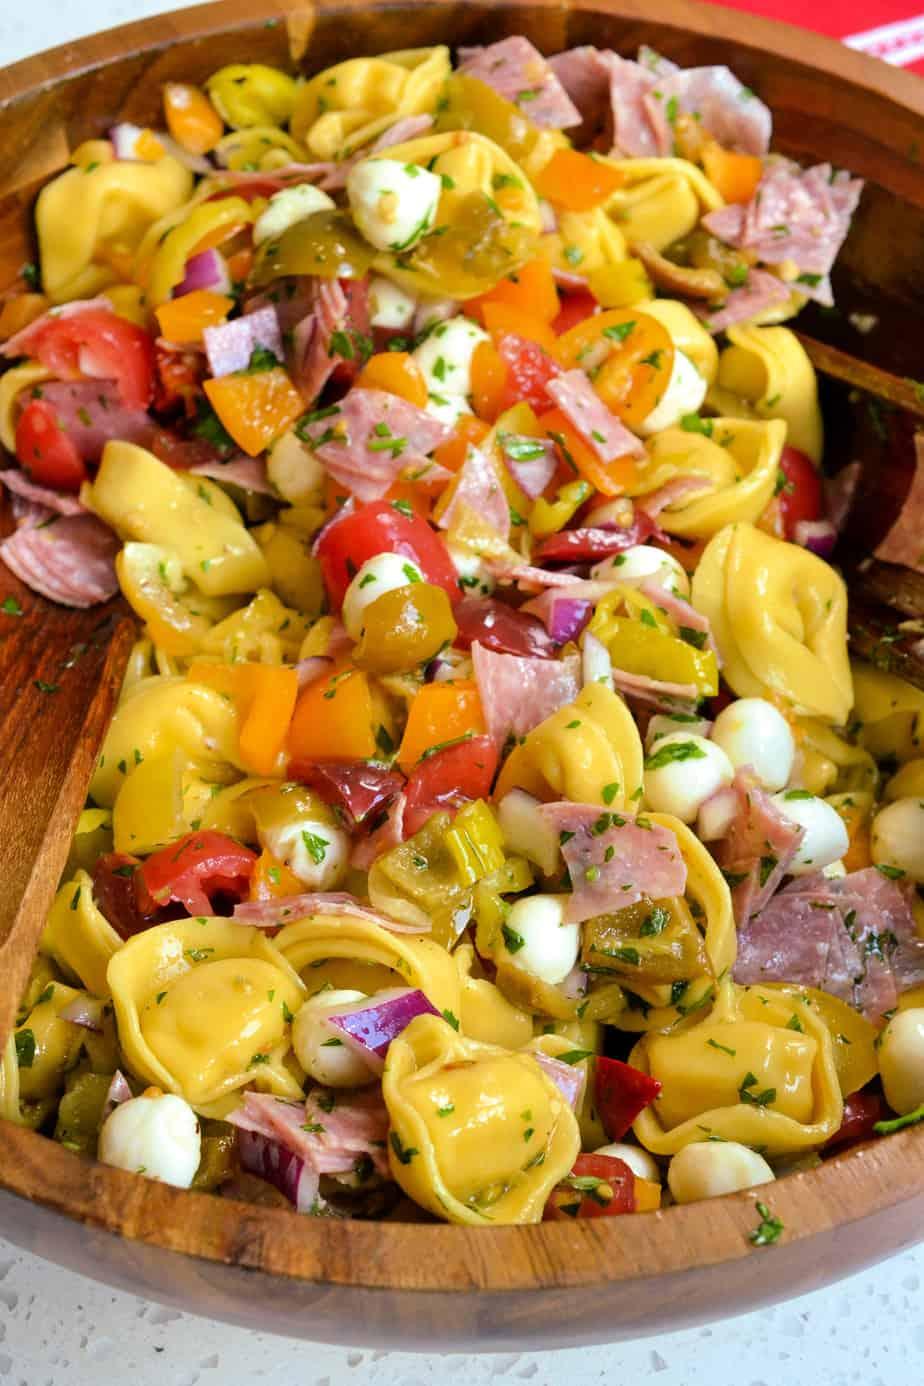 Tortellini Pasta Salad with Italian Dressing